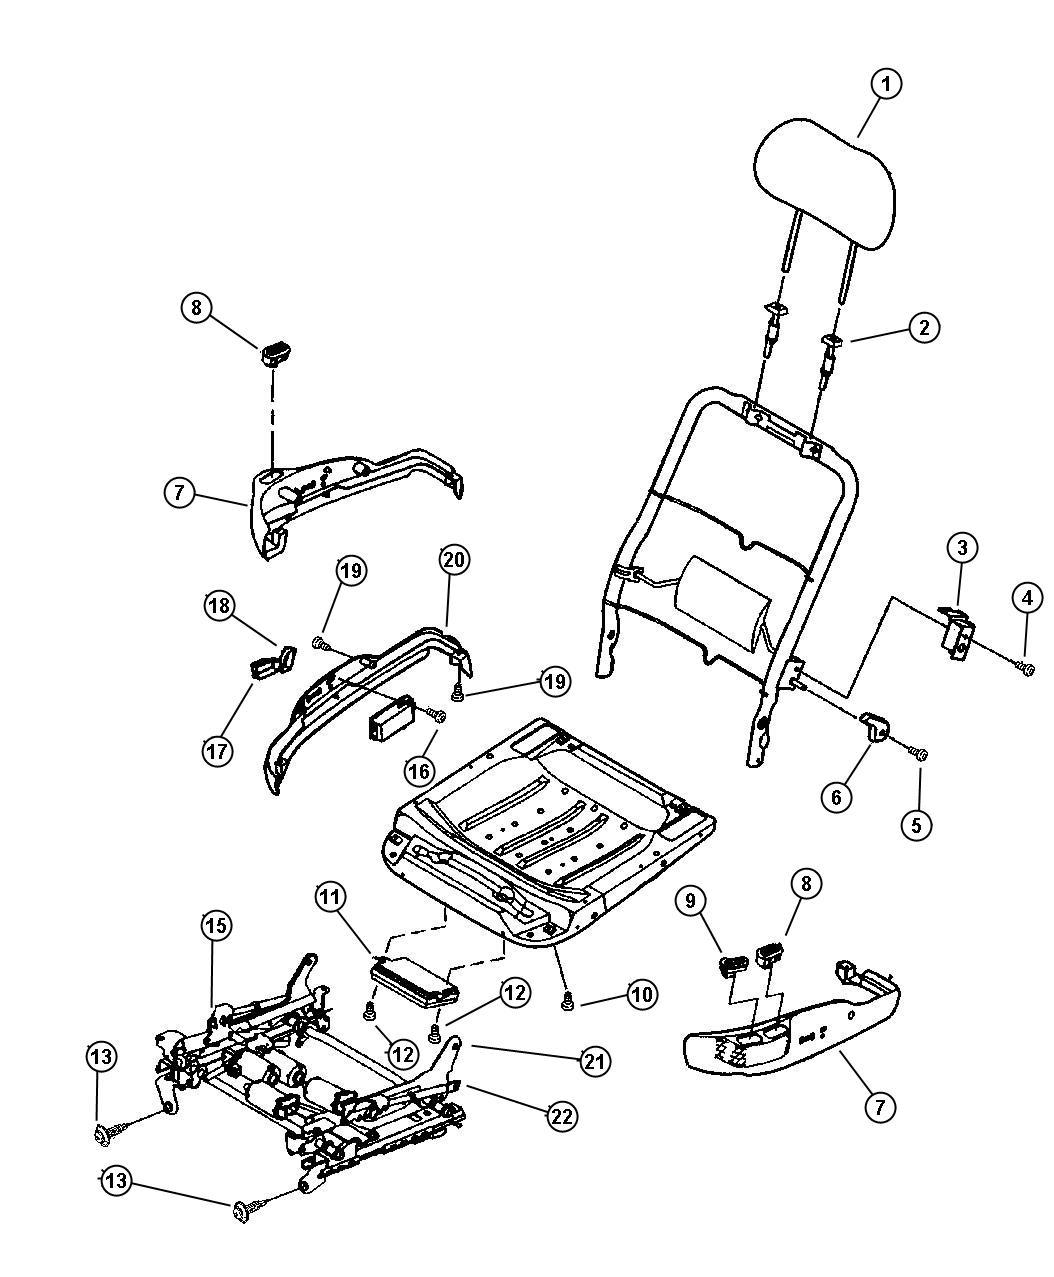 Suzuki Vitara Fuse Panel. Suzuki. Auto Fuse Box Diagram